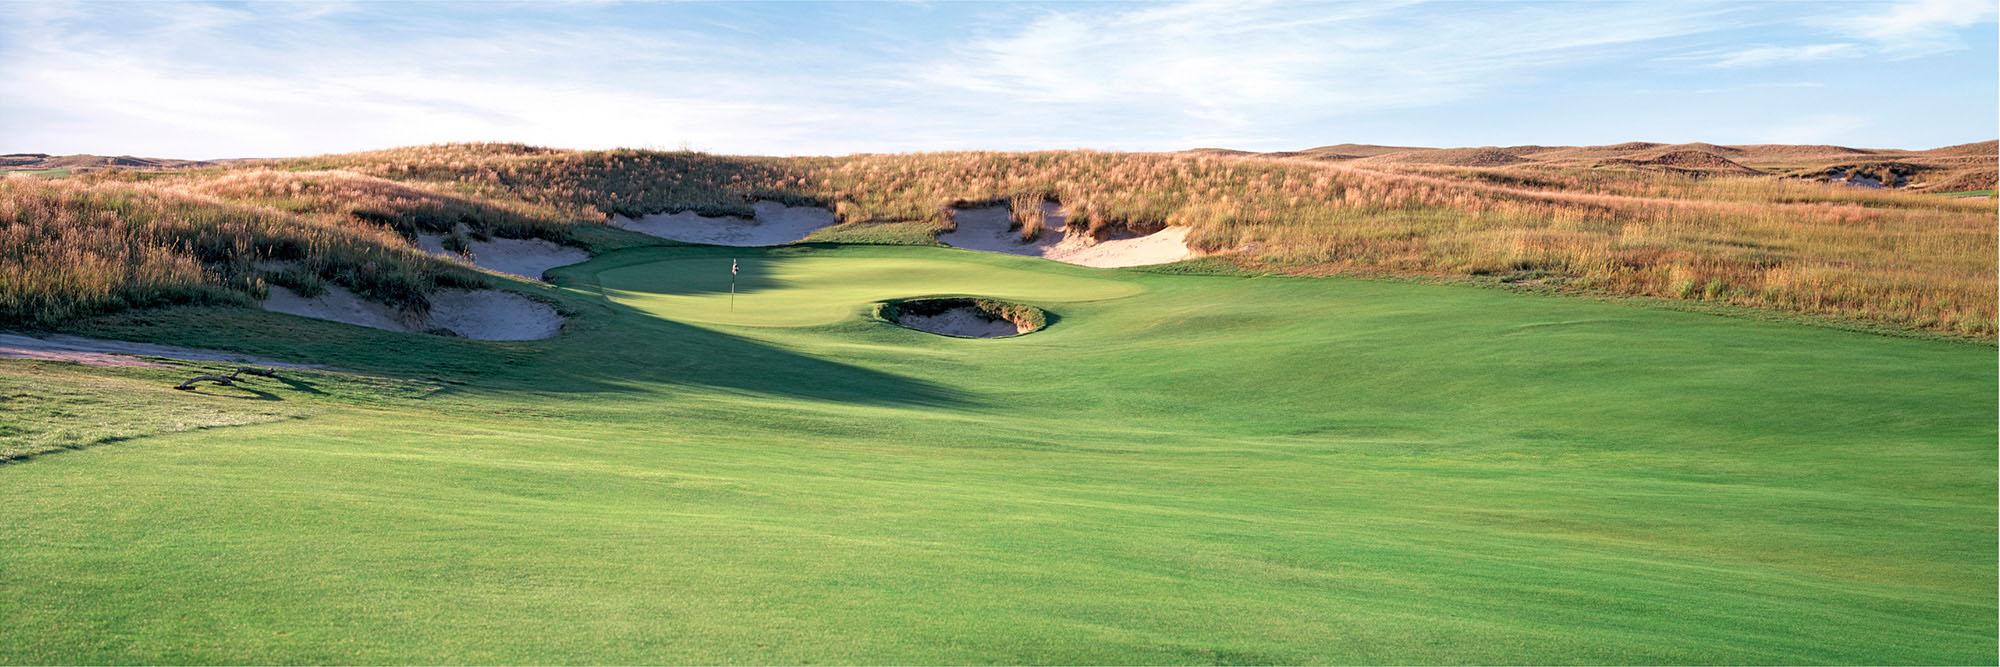 Golf Course Image - Sand Hills No. 8